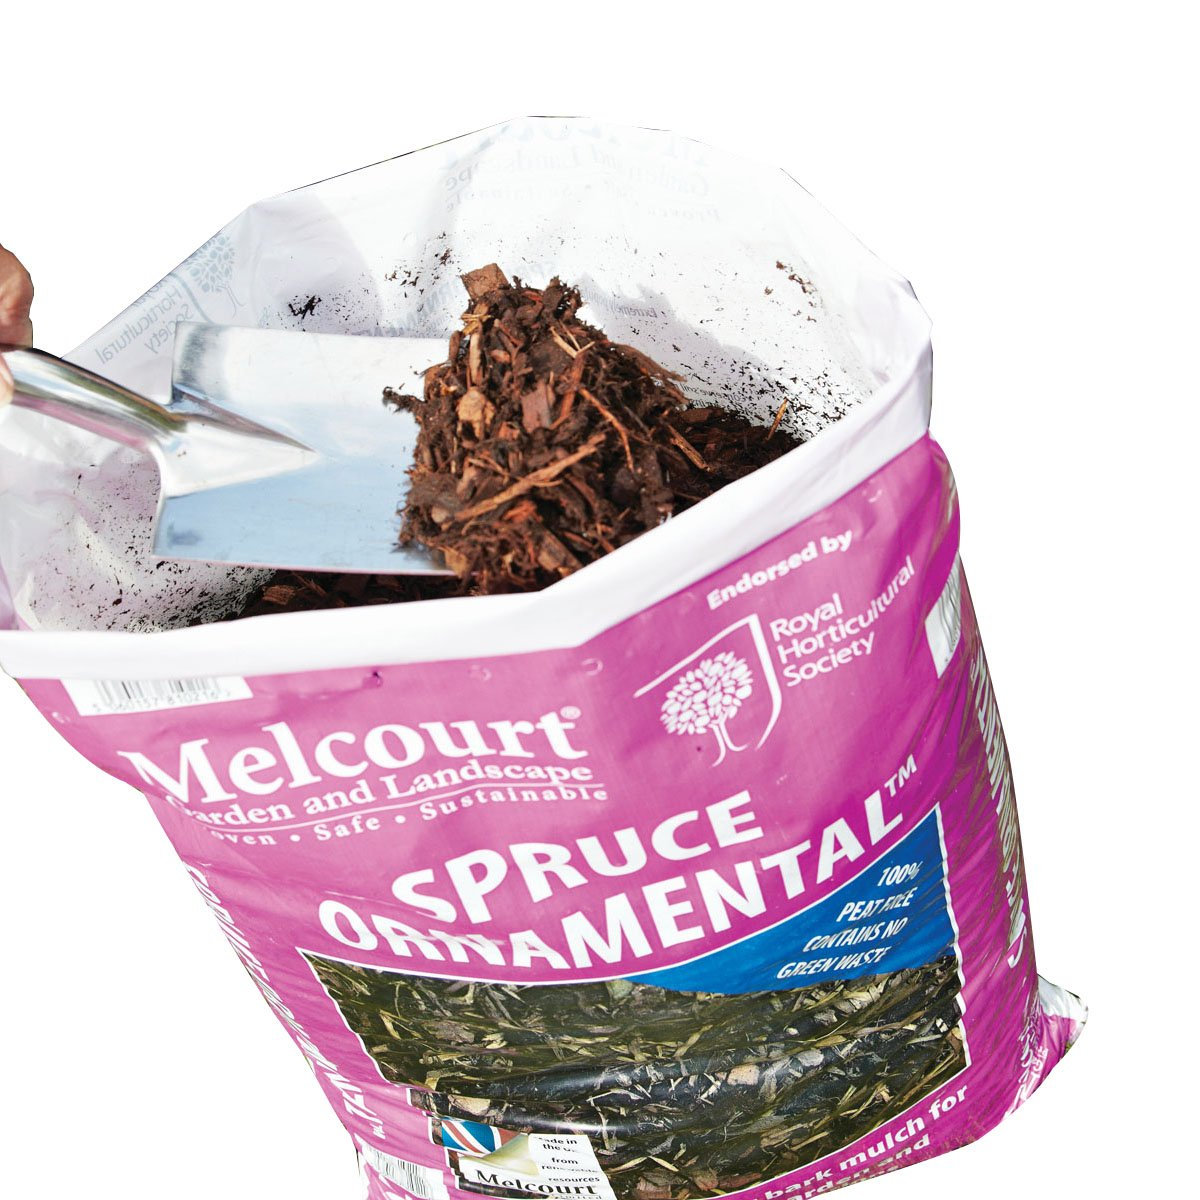 Melcourt Bark Mulch Spruce Ornamental 60L Bag Versatile Mulch Suregreen